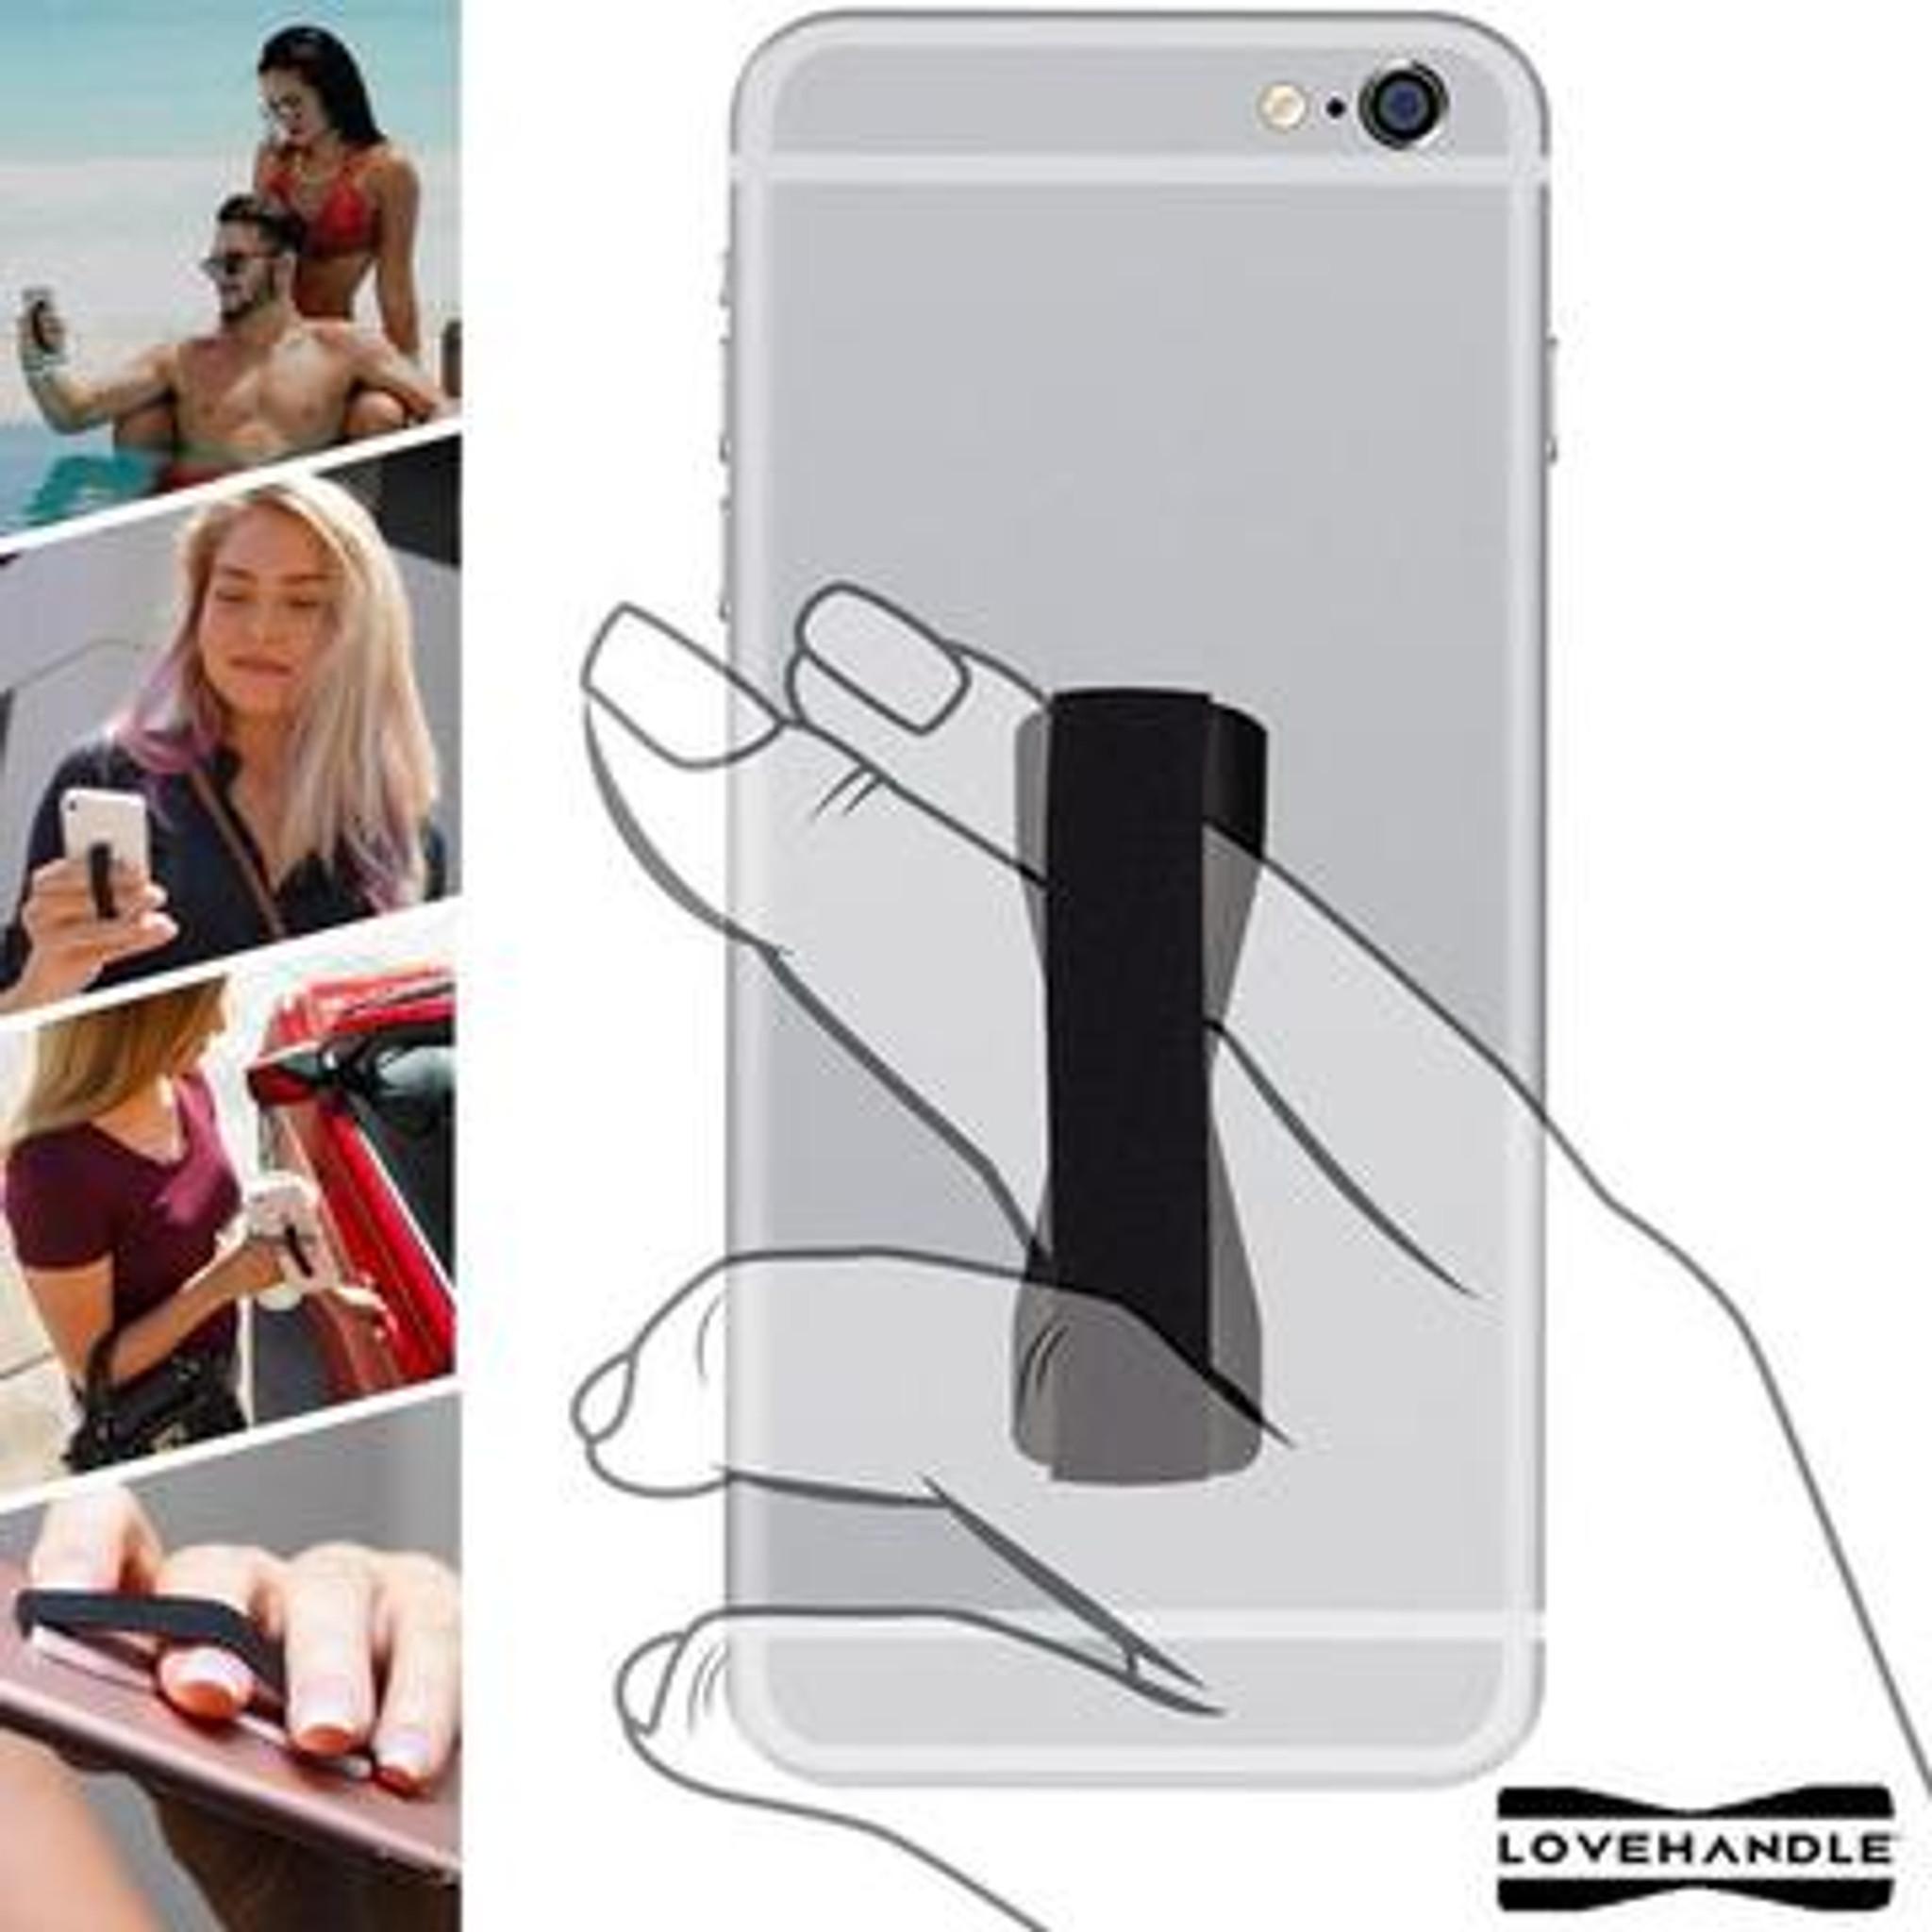 Love Handle Phone Grip - Paws